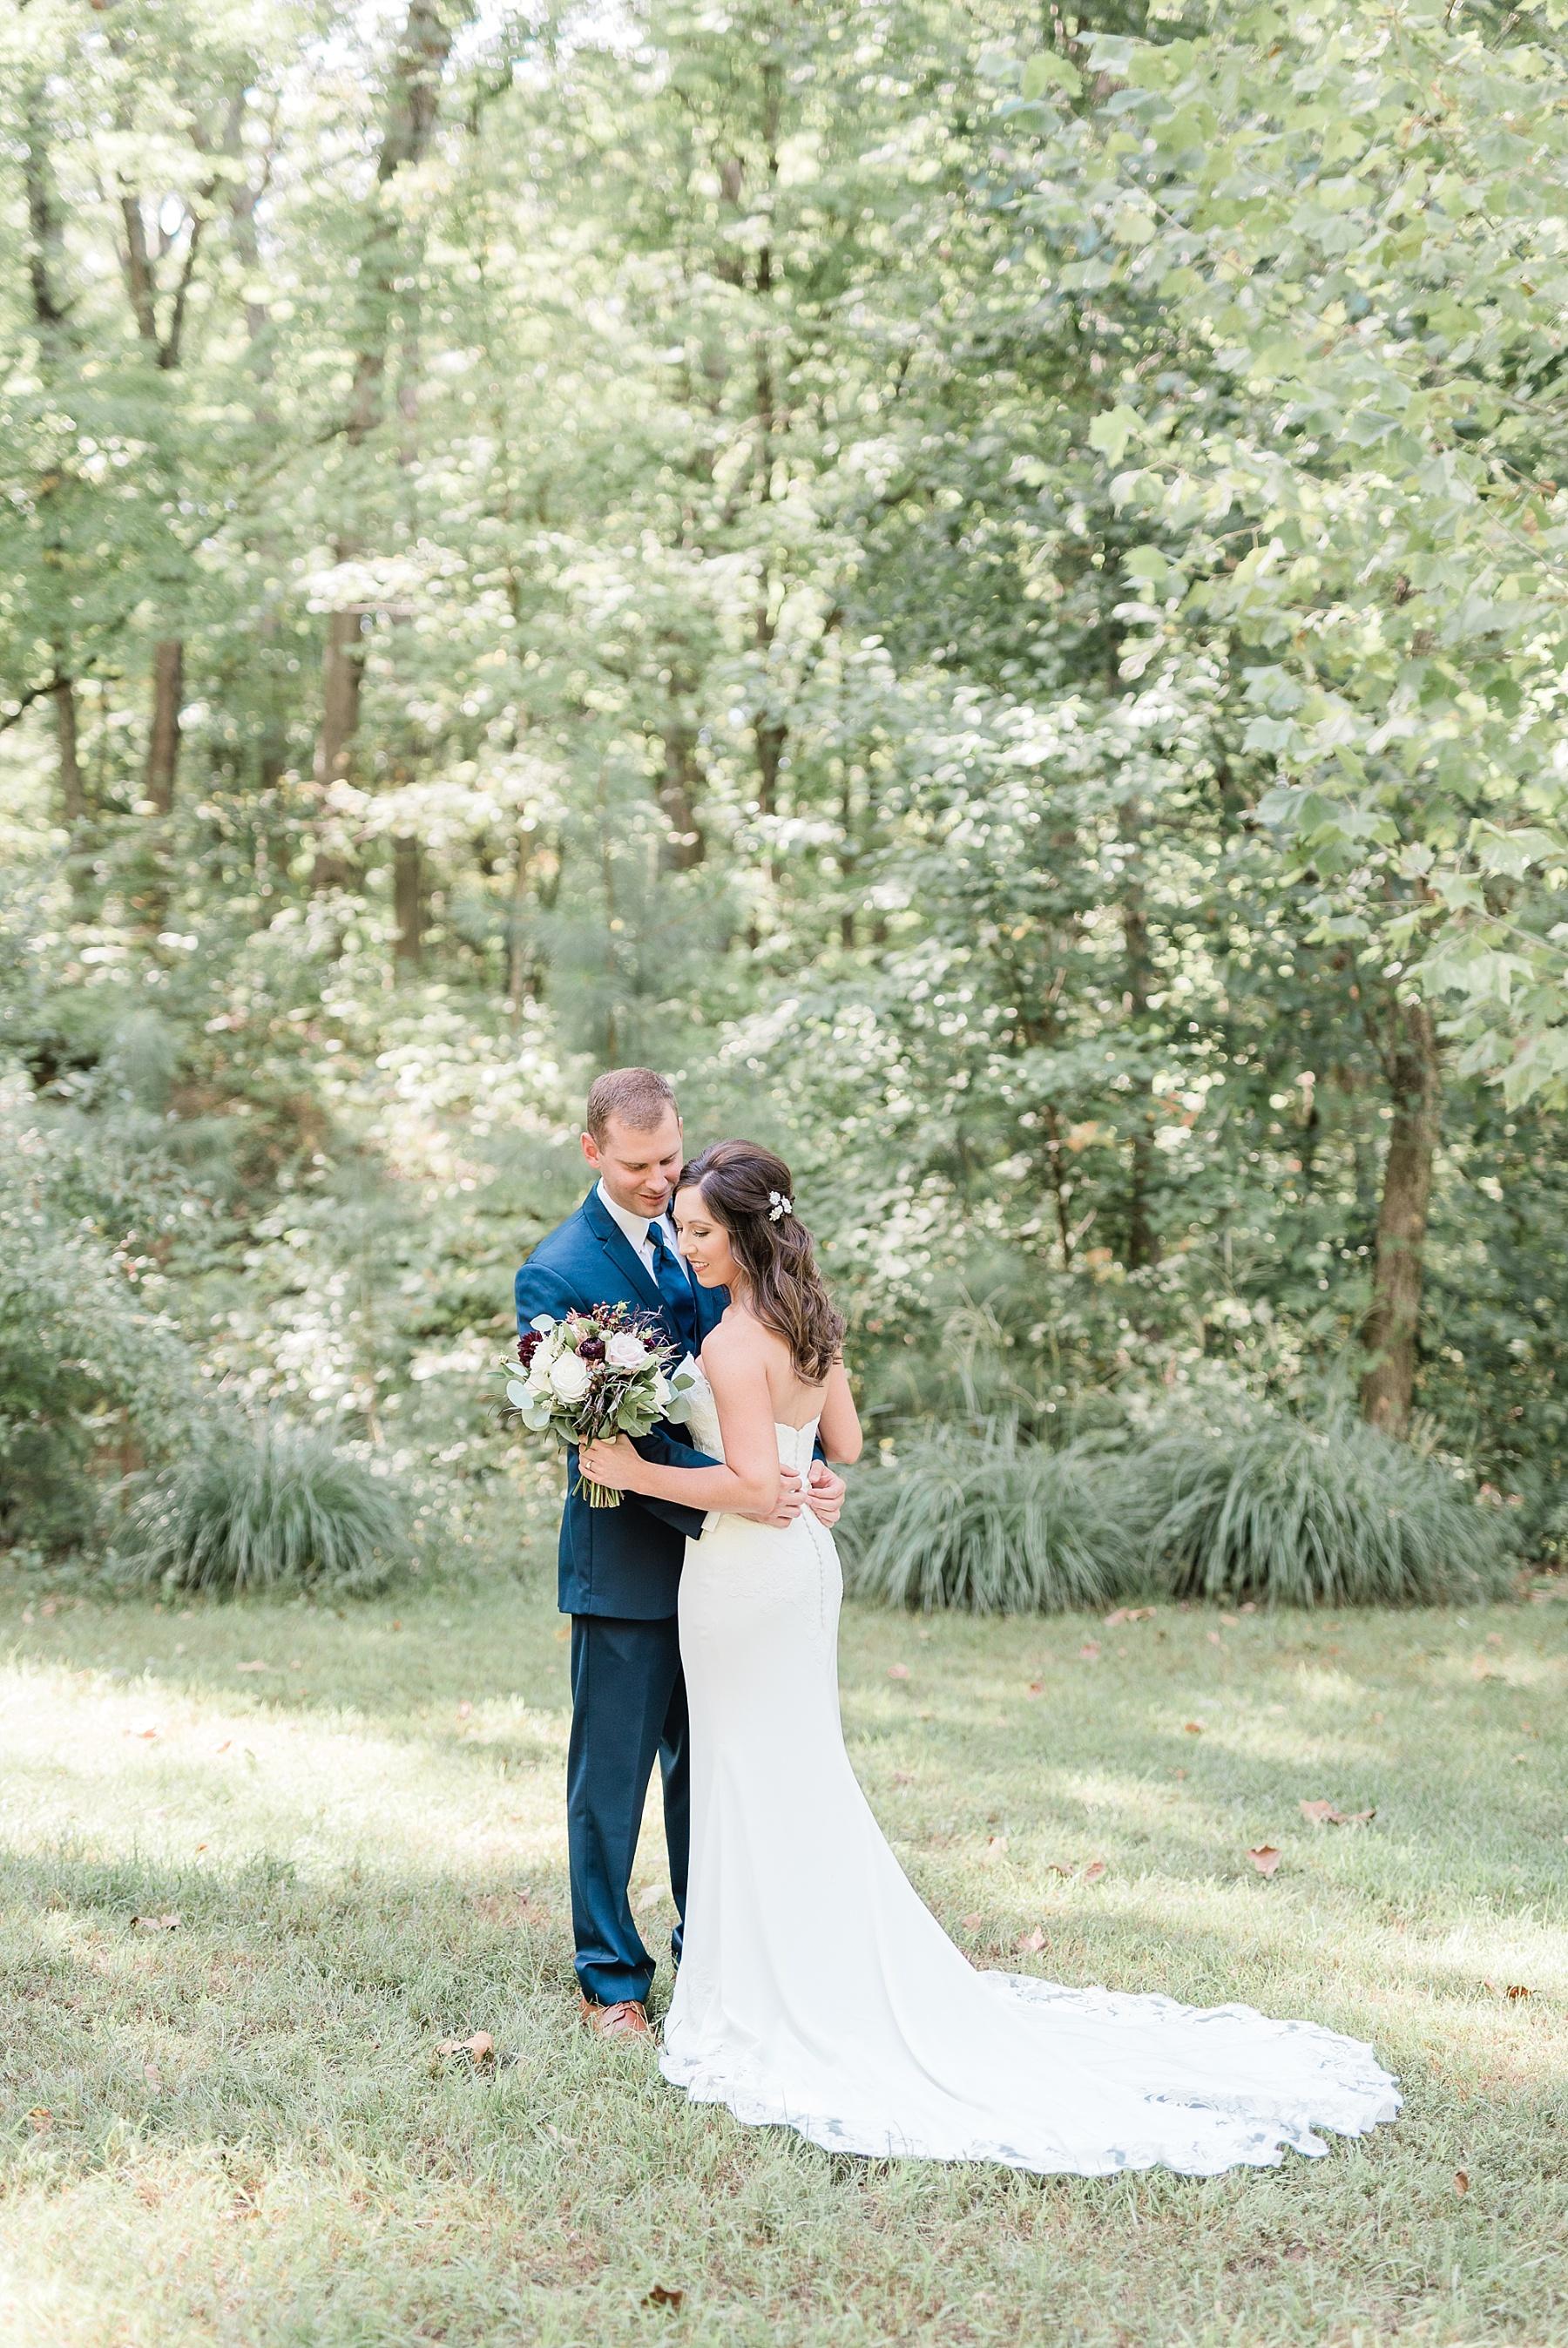 Romantic Summer Sunset Wedding Ceremony at Little Piney Lodge St. Louis Missouri by Kelsi Kliethermes Photography Fine Art Photographer_0047.jpg